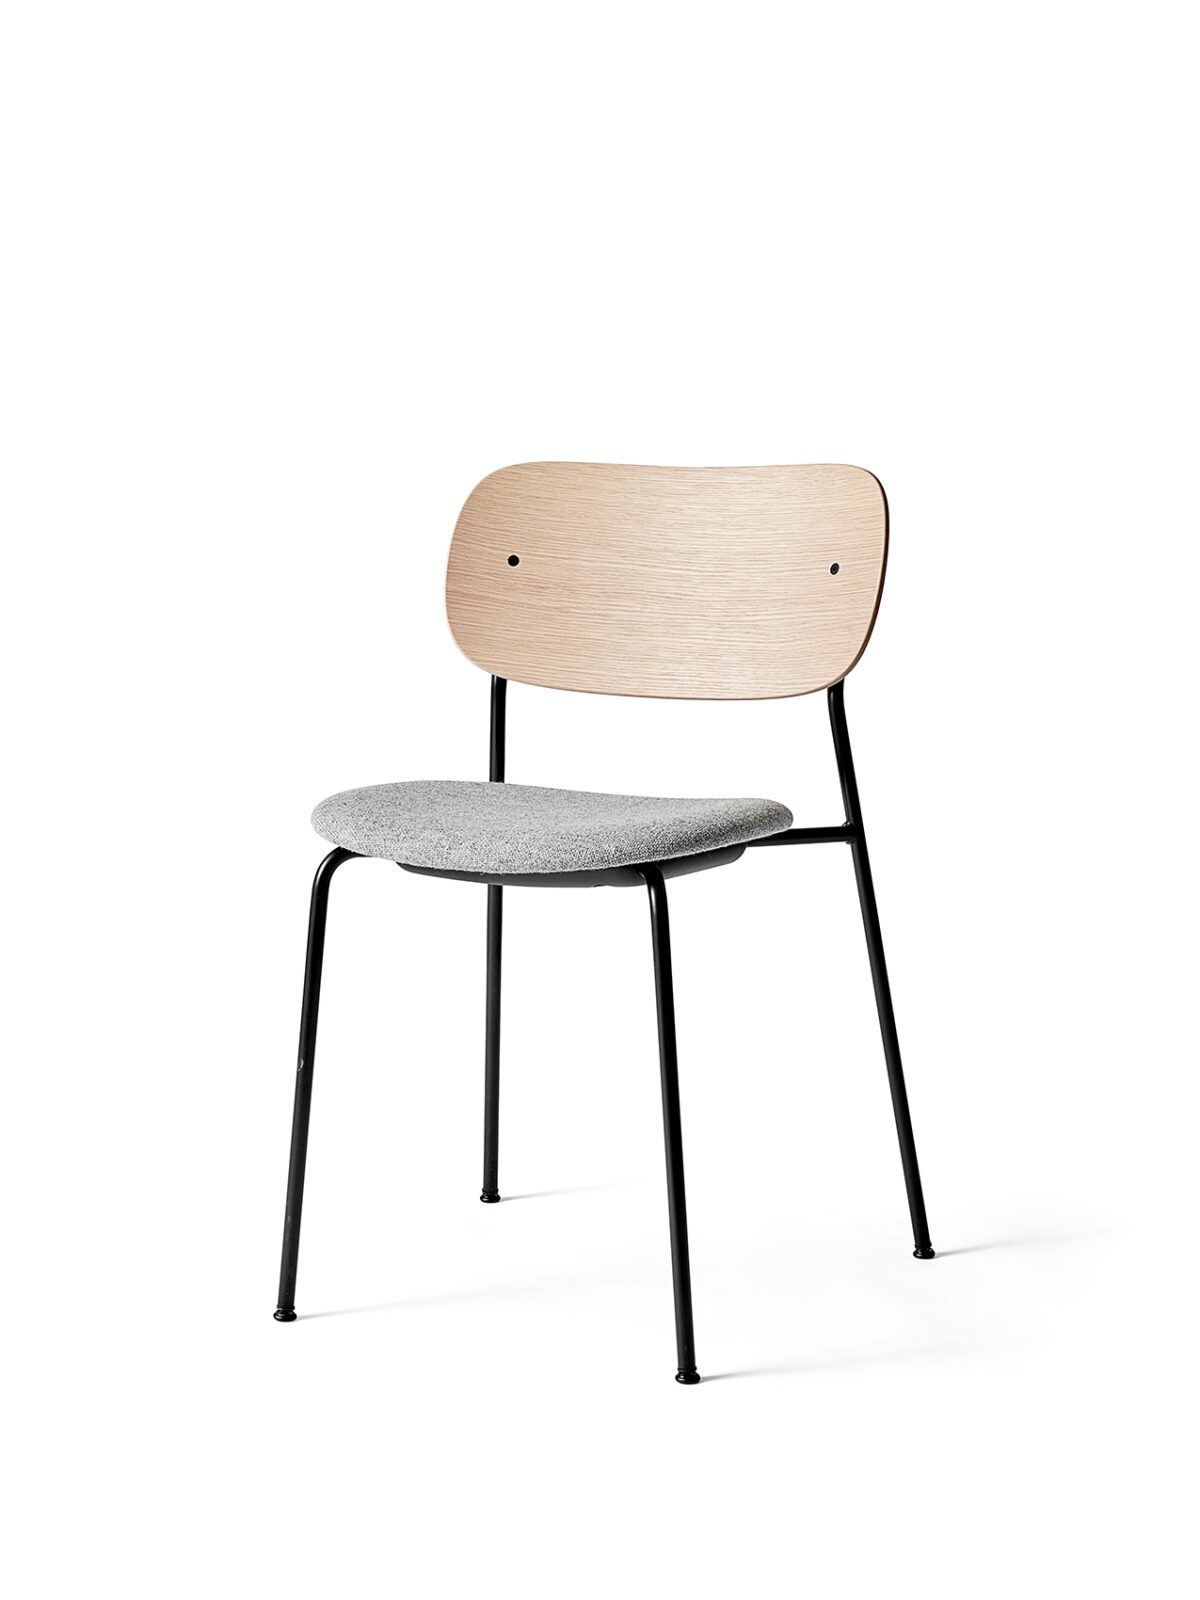 1166039 Co Dining Chair Natural Oak Hallingdal 65   130 angle